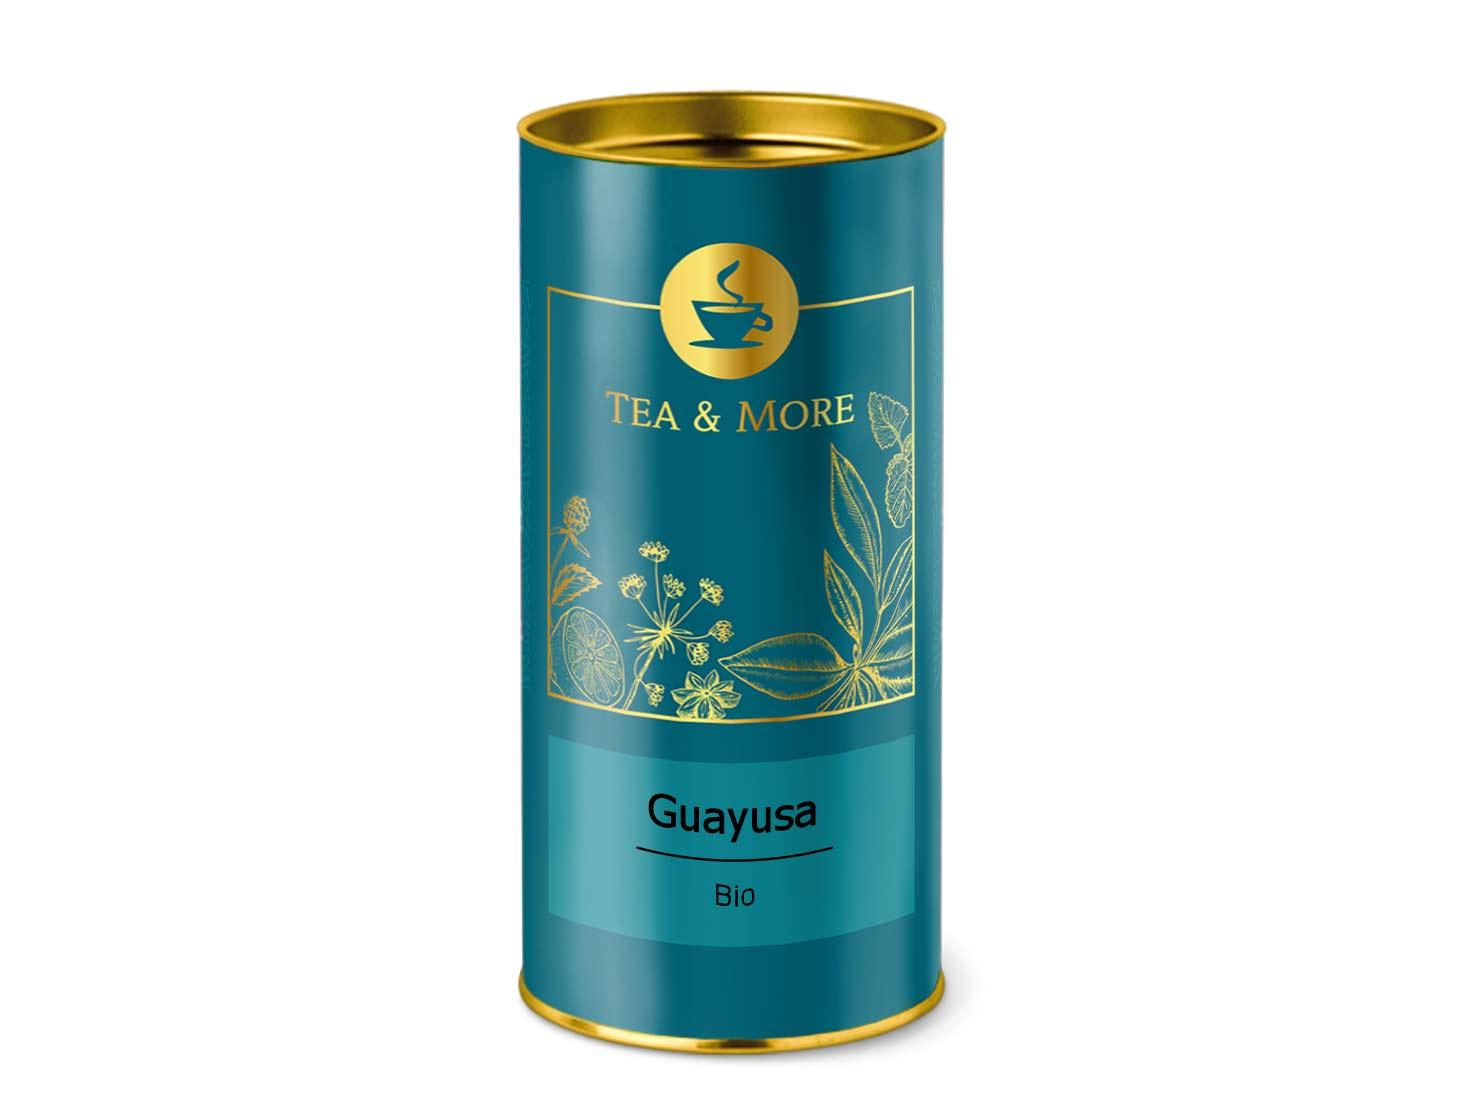 Ilex Guayusa (Bio)